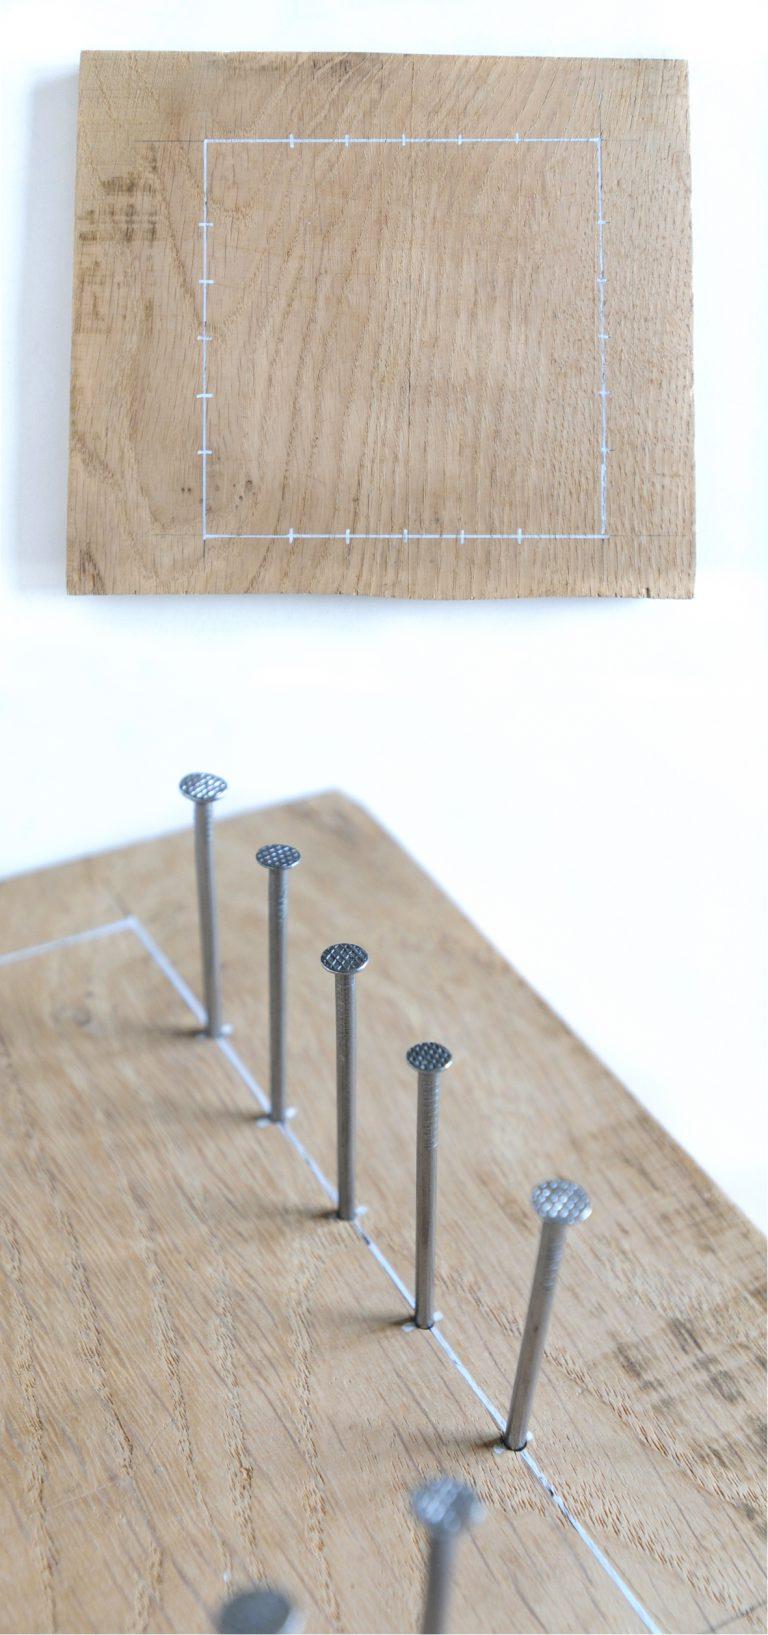 little-idea-planche-clou-metier-a-tisser-tawashi-2